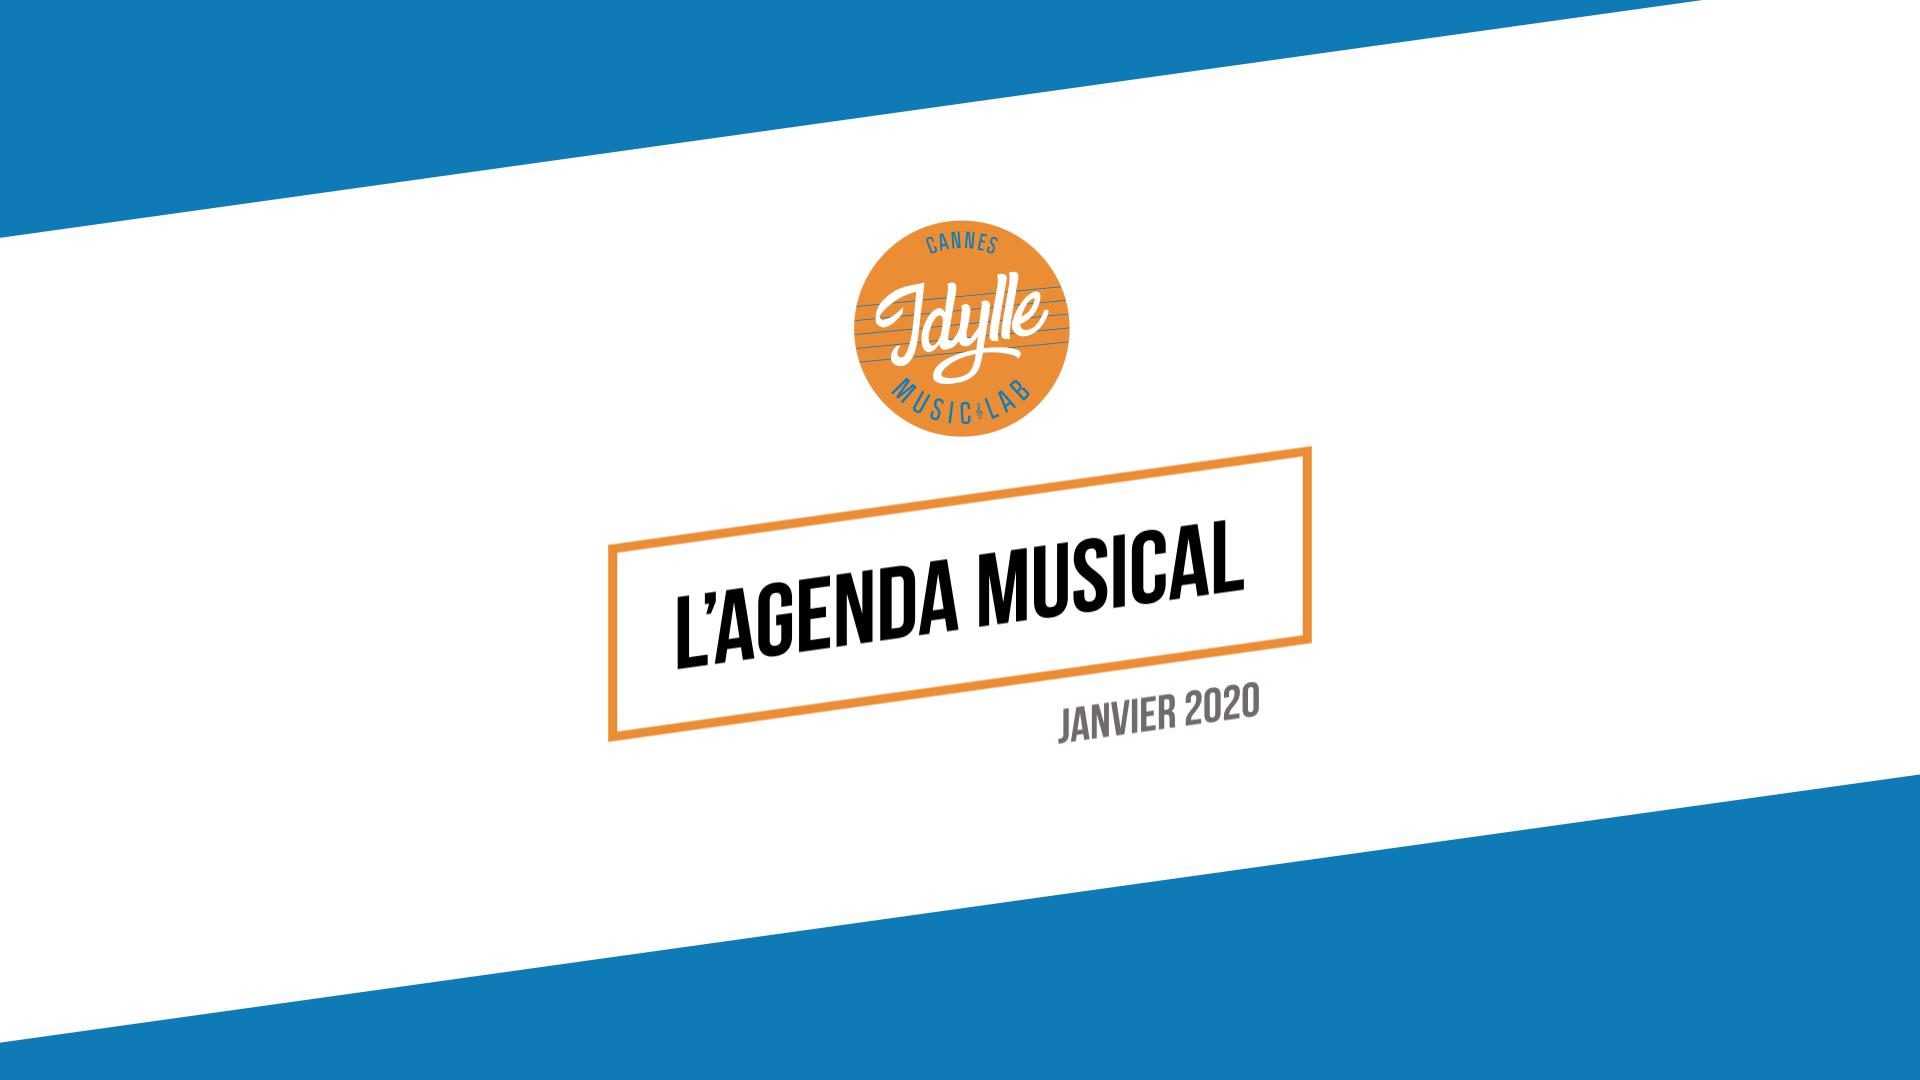 L'agenda musical Idylle Music Lab™ – janvier 2020